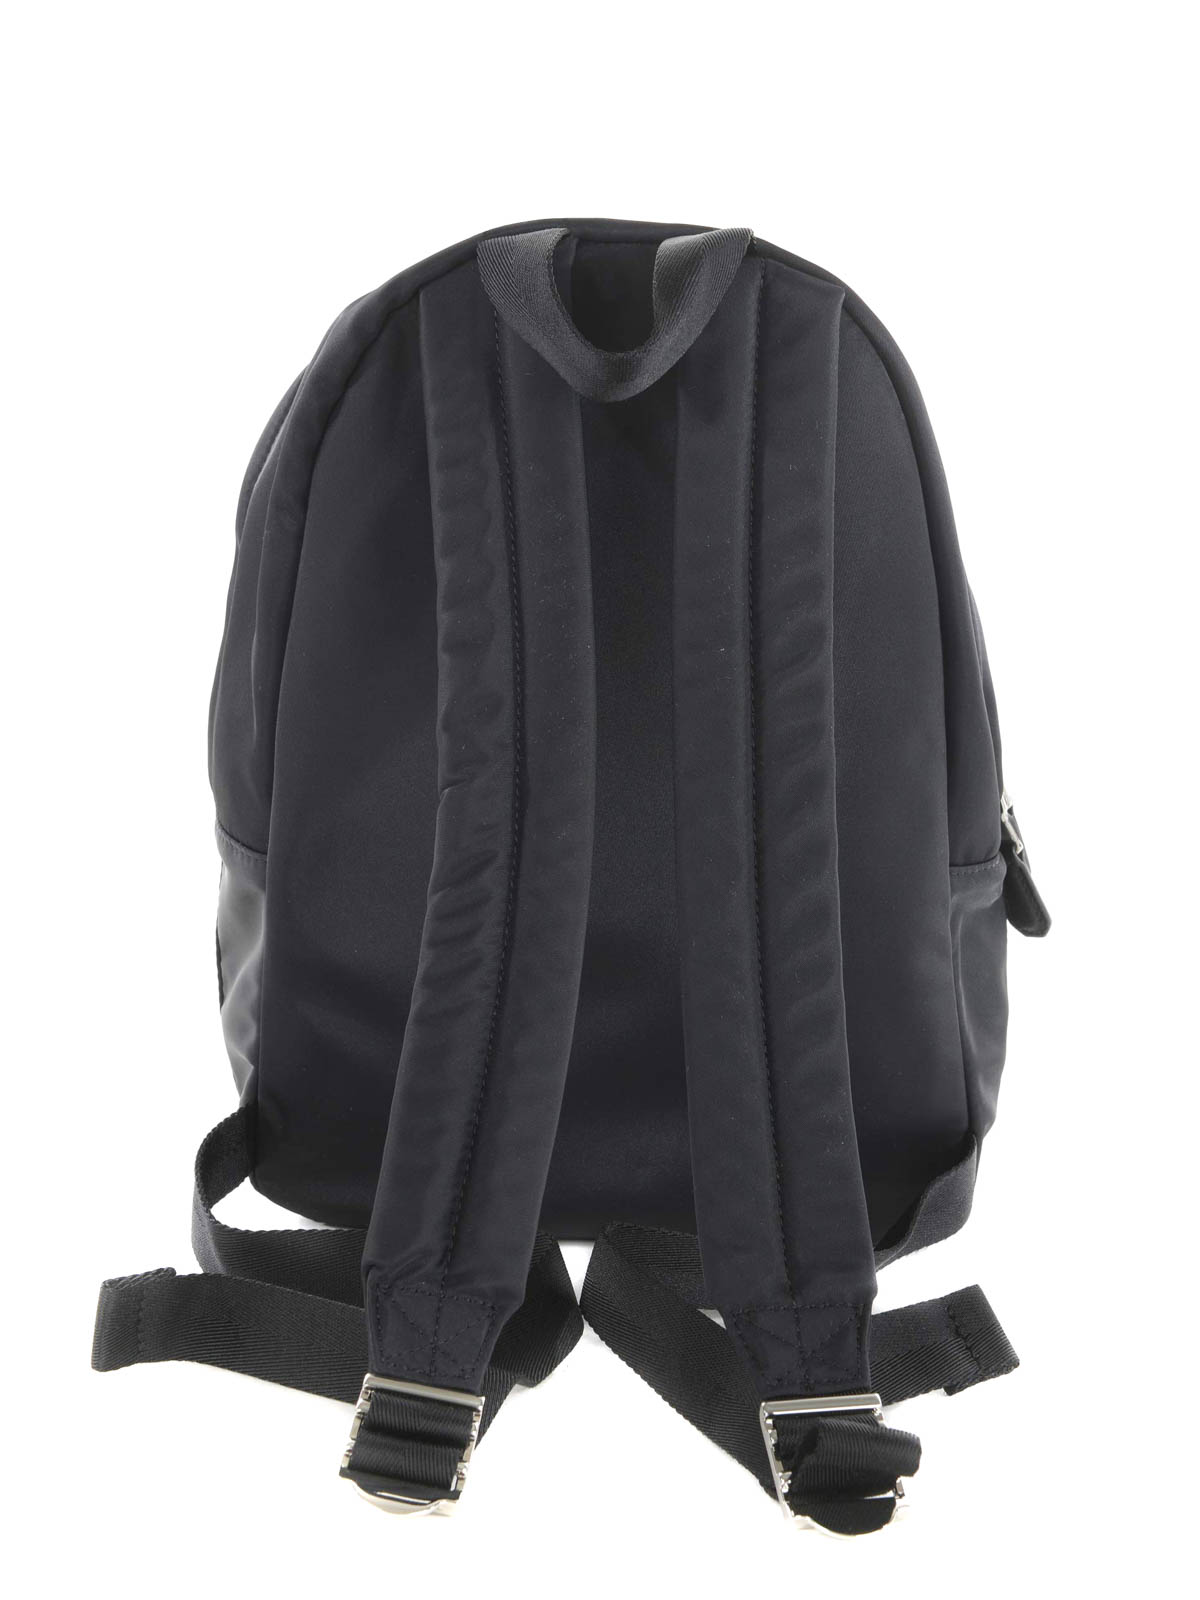 iKRIX Versus Versace  backpacks - LION HEAD DETAIL NYLON BACKPACK 9d41c0312ce85